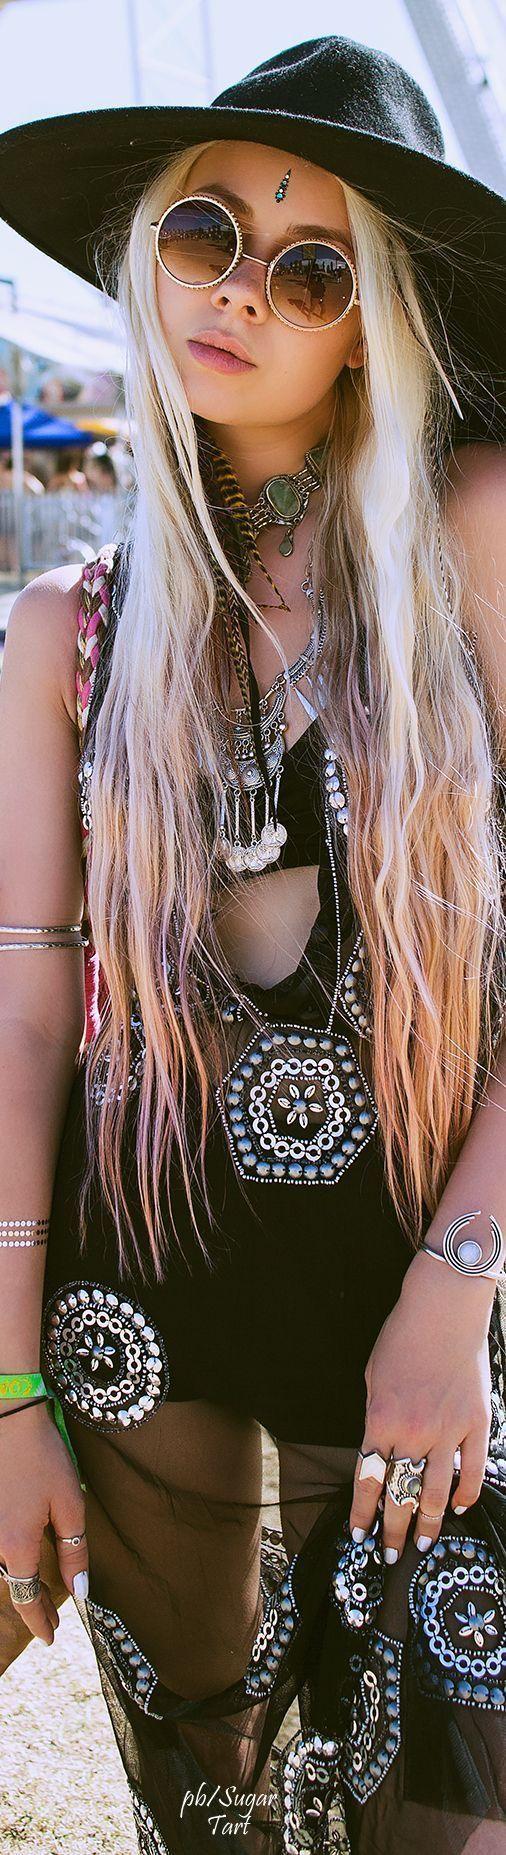 Fashion & Beauty 40+ Amazing Boho Fashion Inspirations, die einfach herrlich sind – Fashion & Beauty › 2019 – 2020